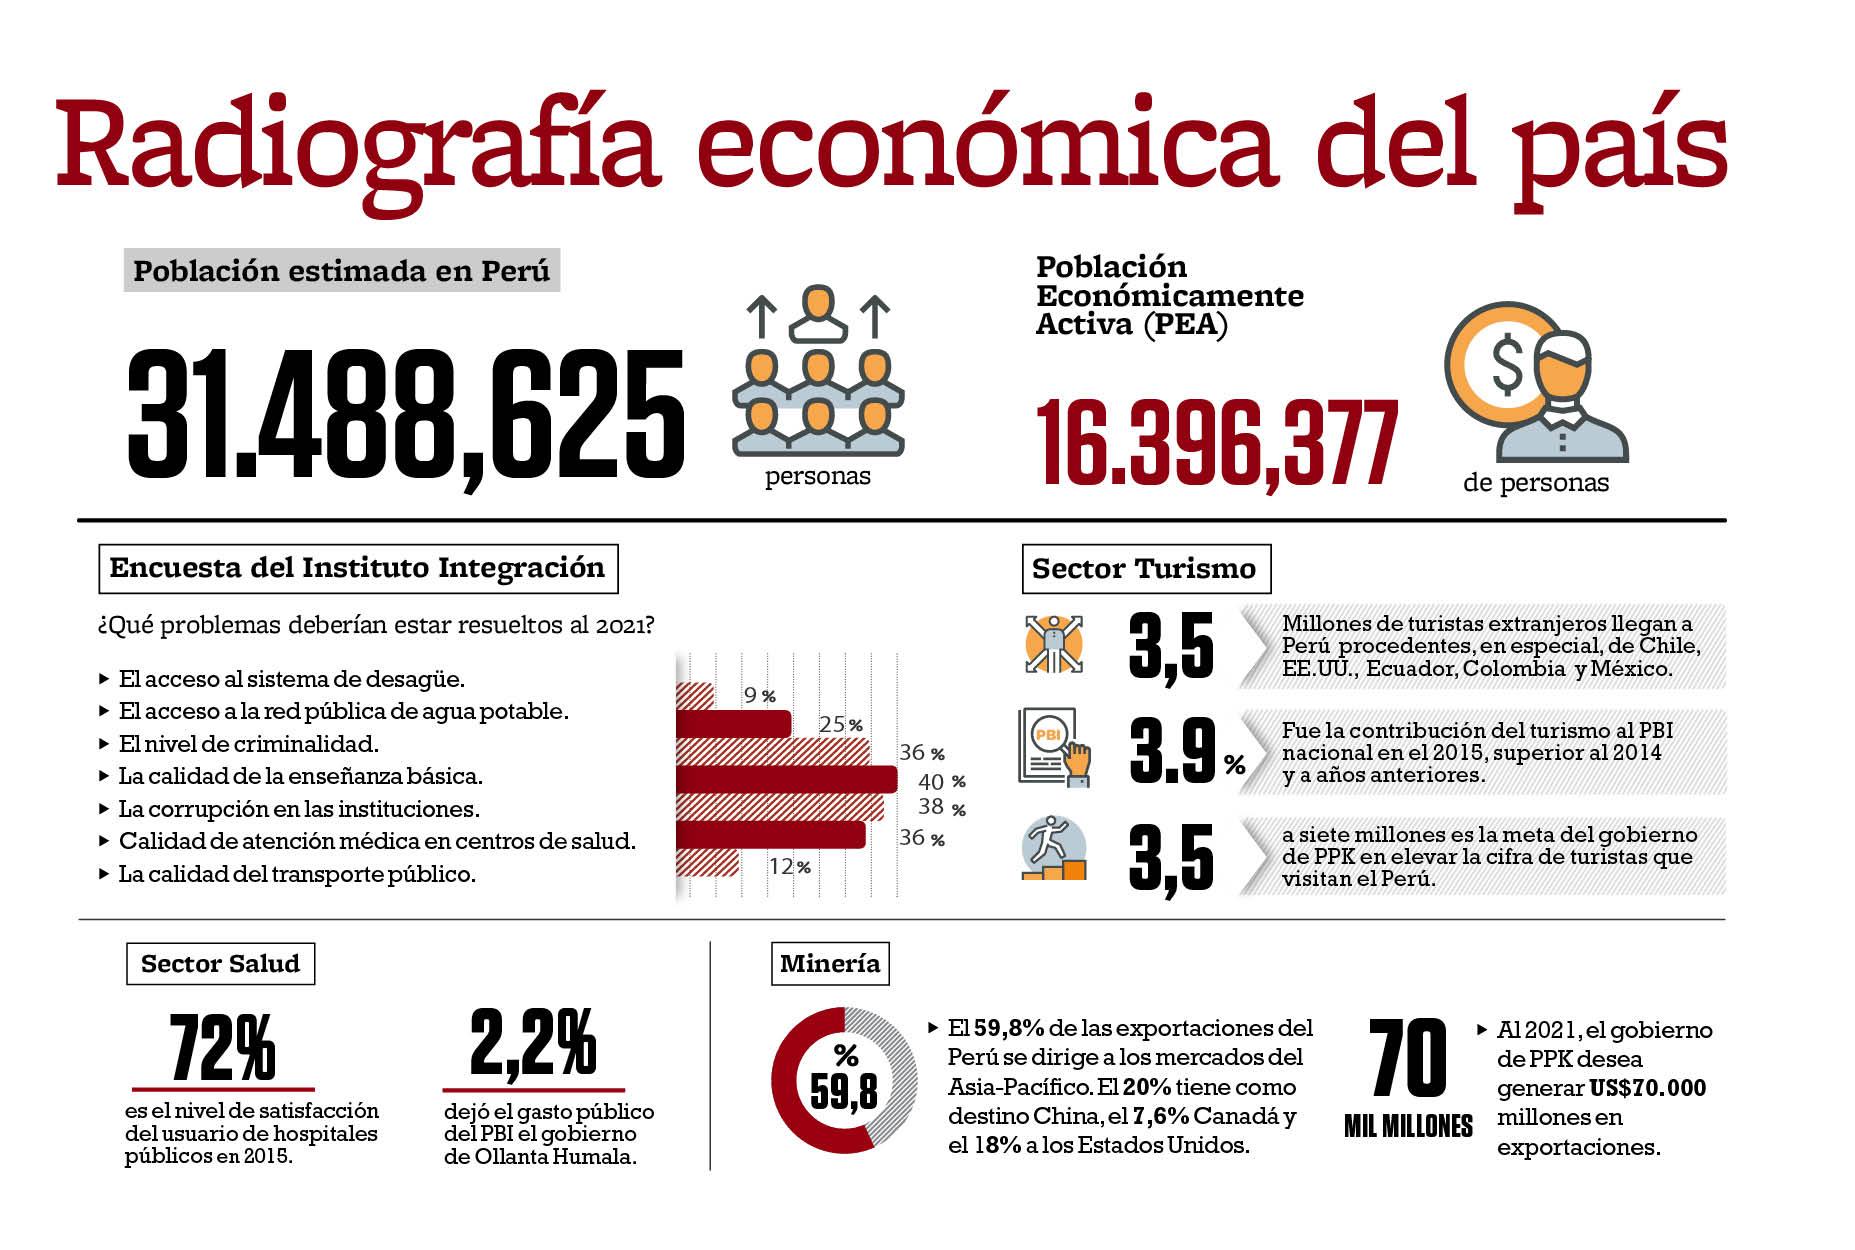 CADE 2016: panorama económico en cifras